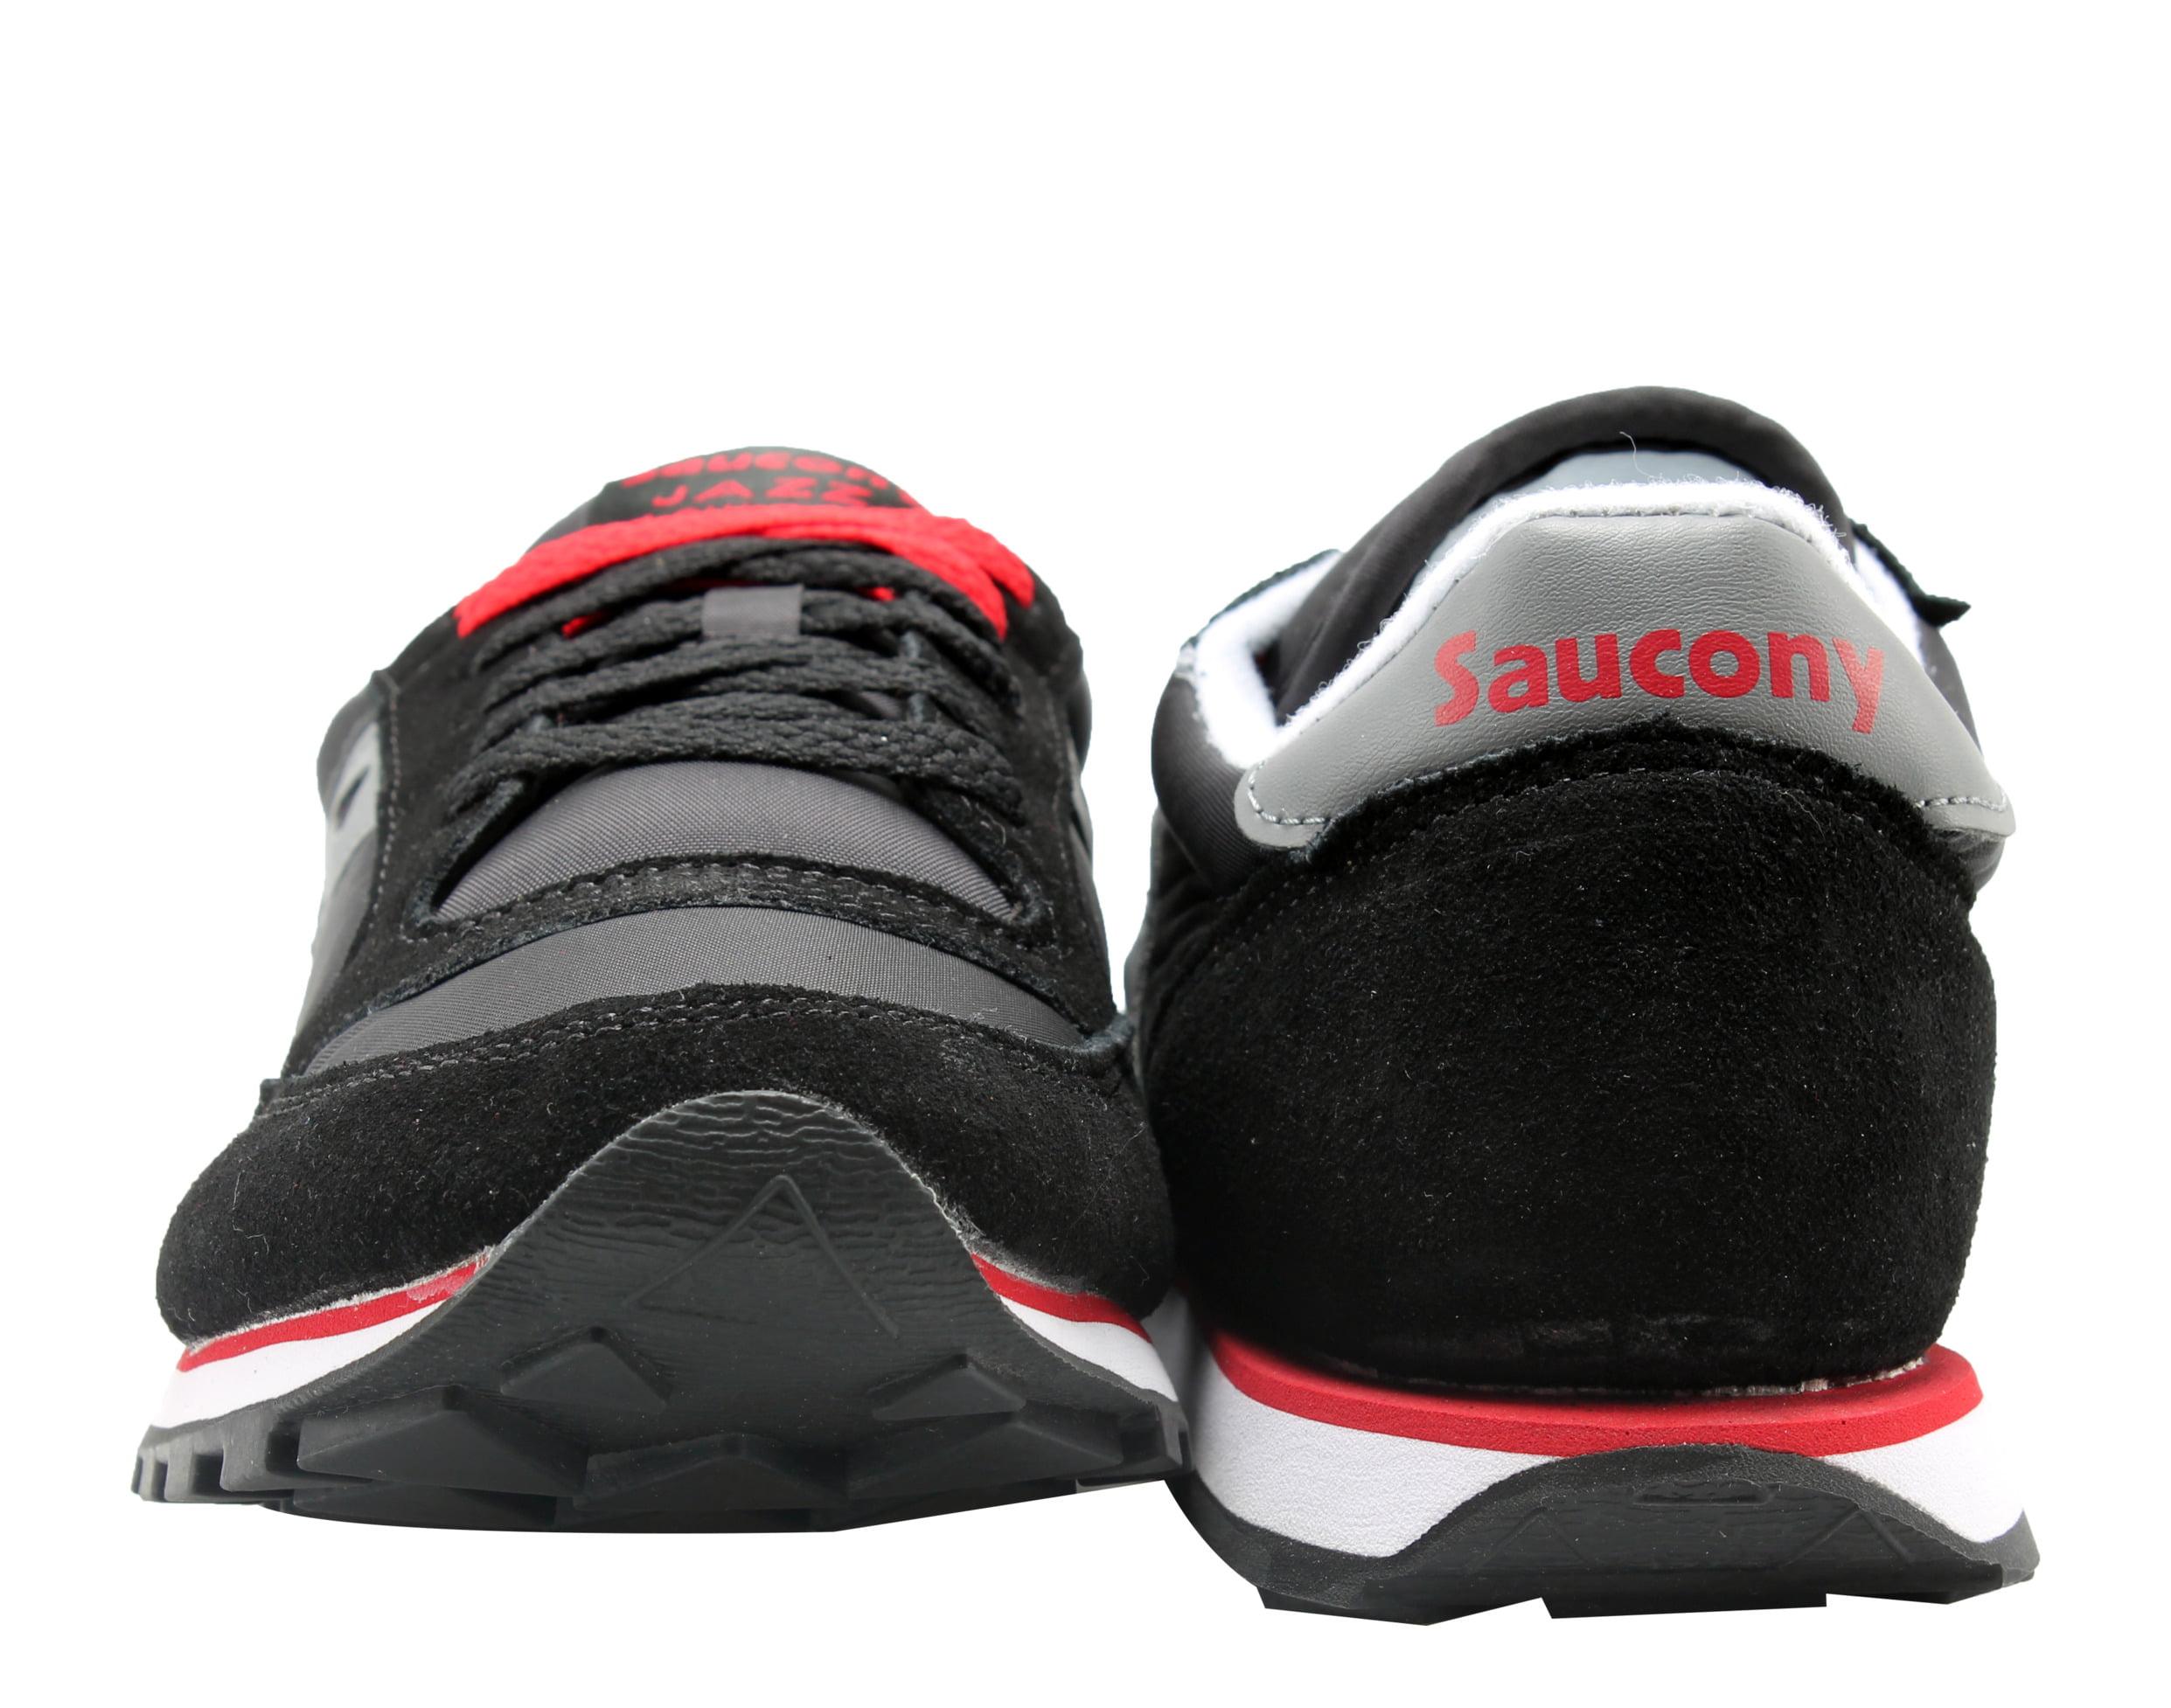 Saucony Jazz Low Pro Black/Grey/Red Men's Running Shoes 2866-7